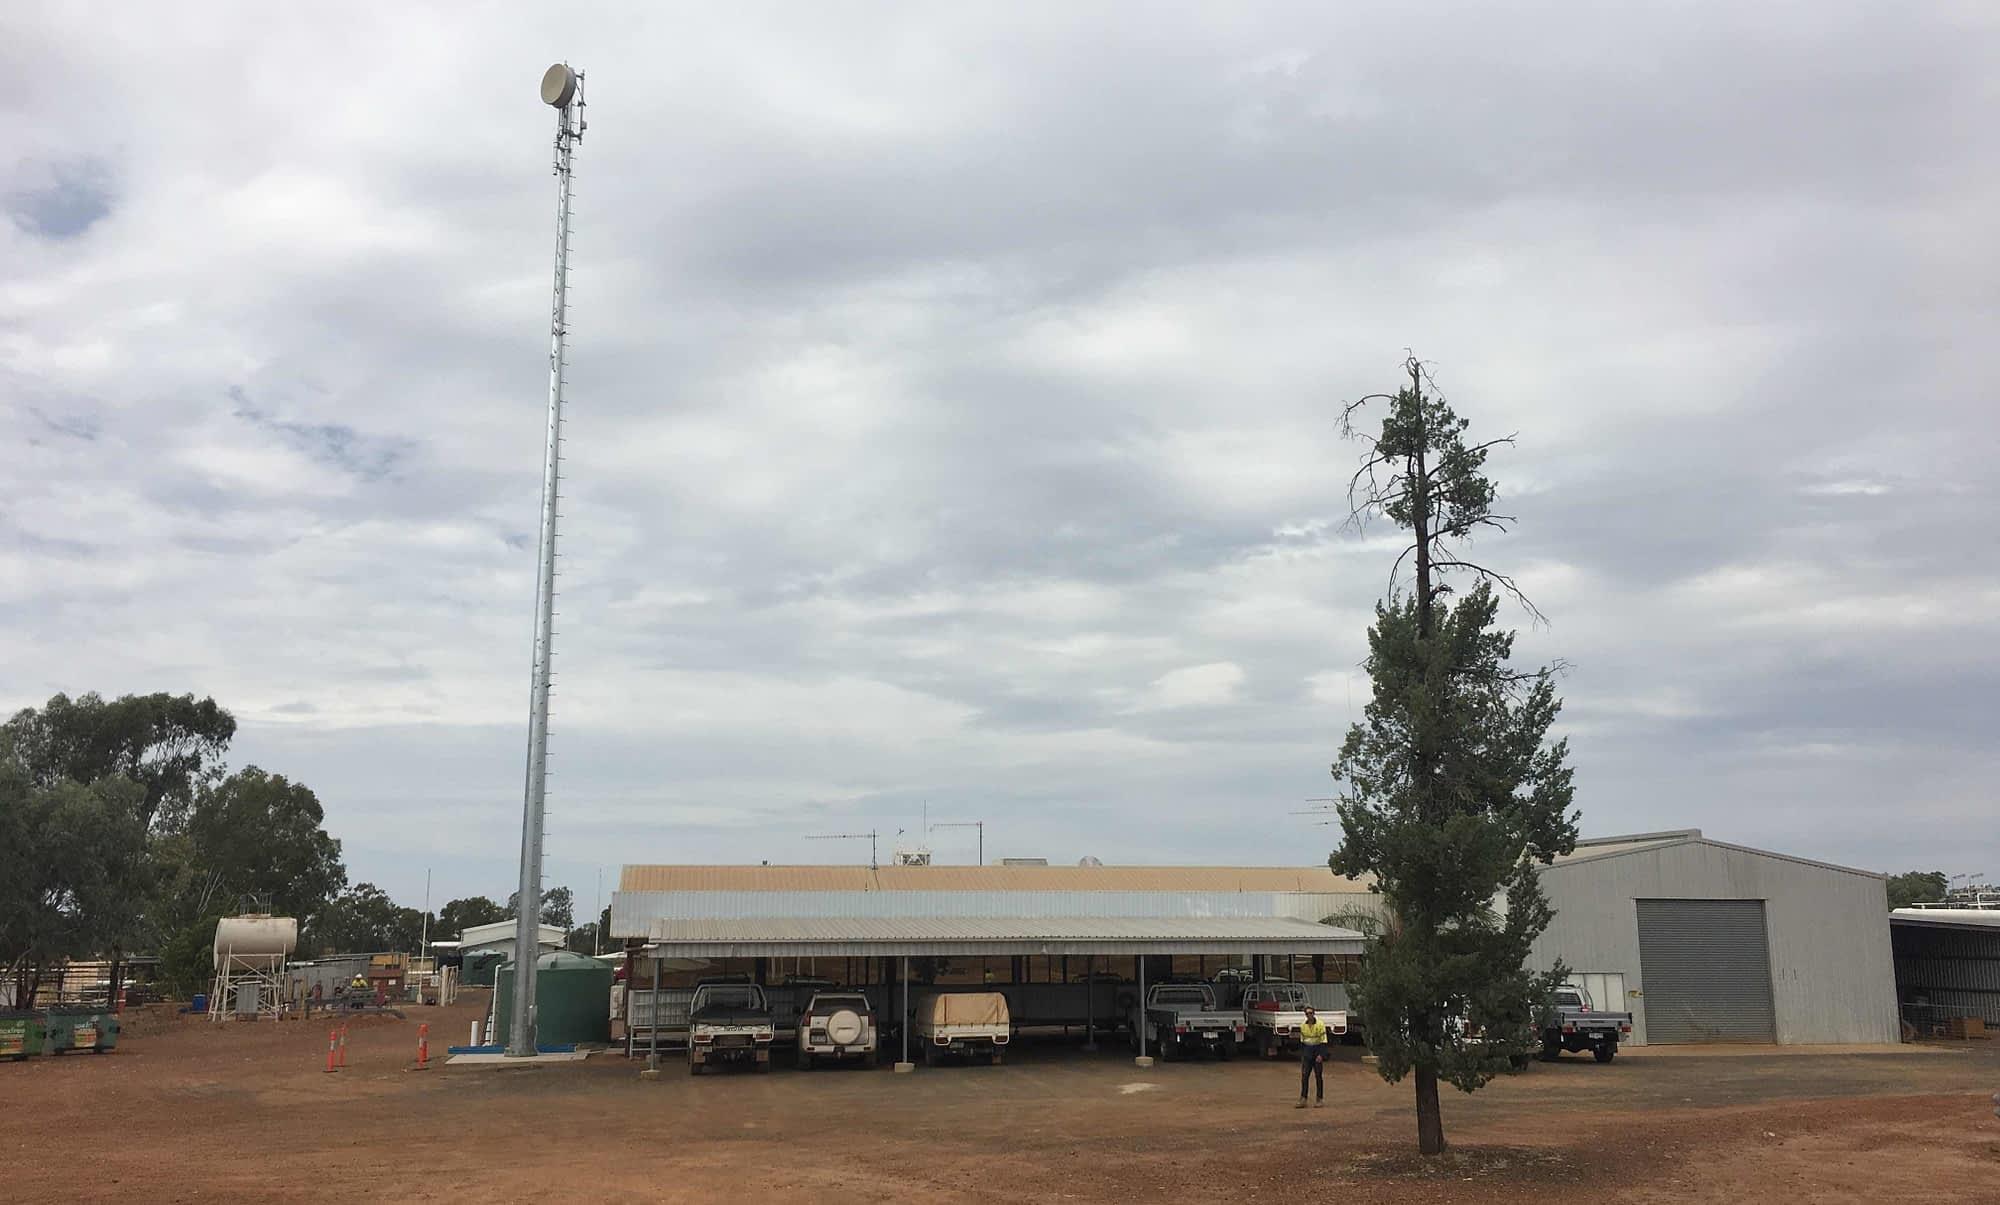 kincora gas processing facility kincora qld telecommunications internet